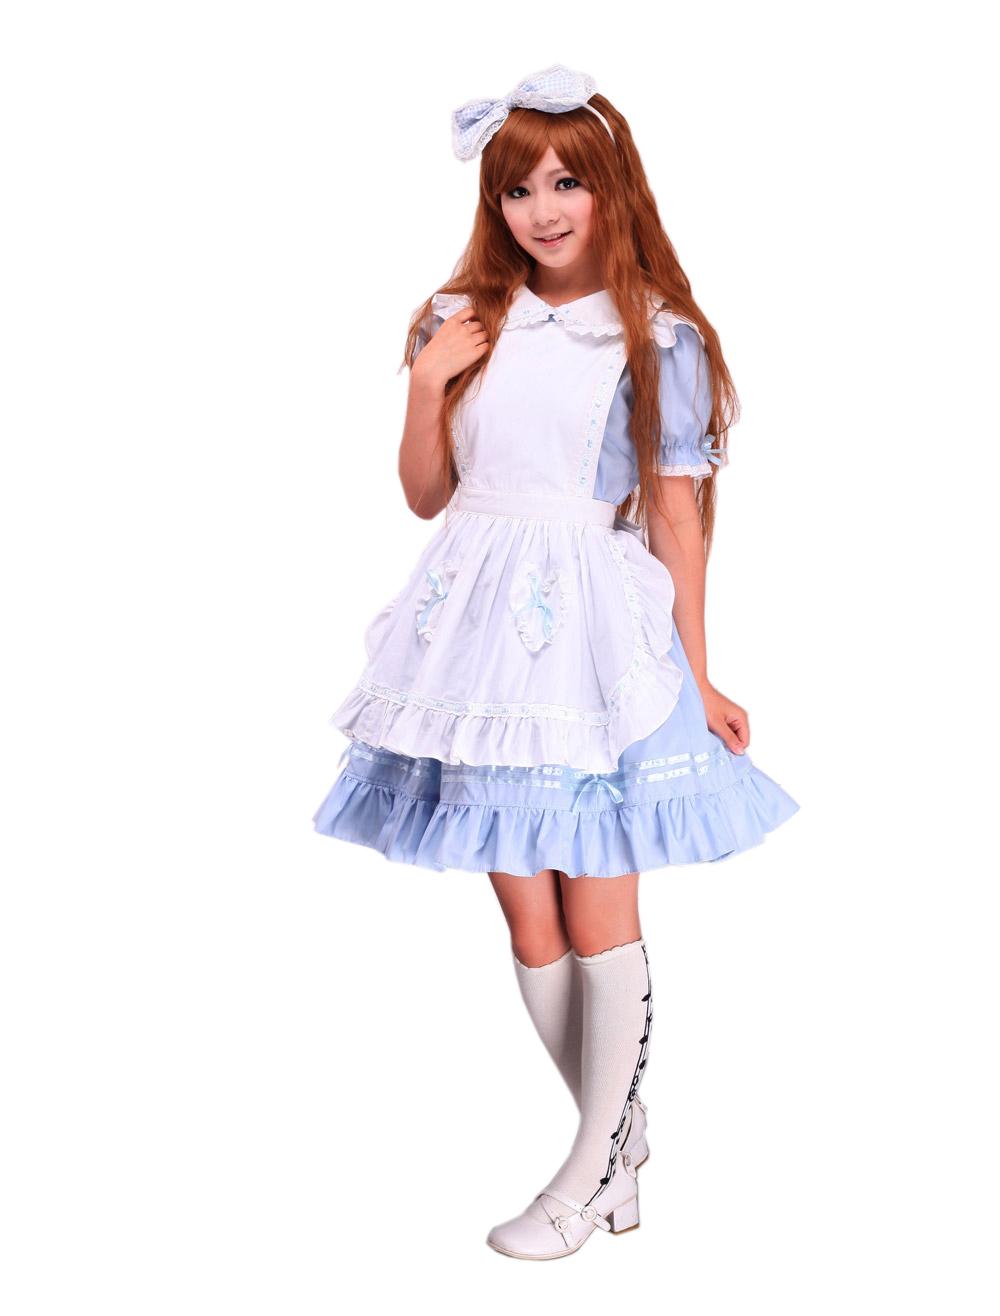 Zeromart Blue Cotton Ruffles Maid Cosplay Vintage -2071